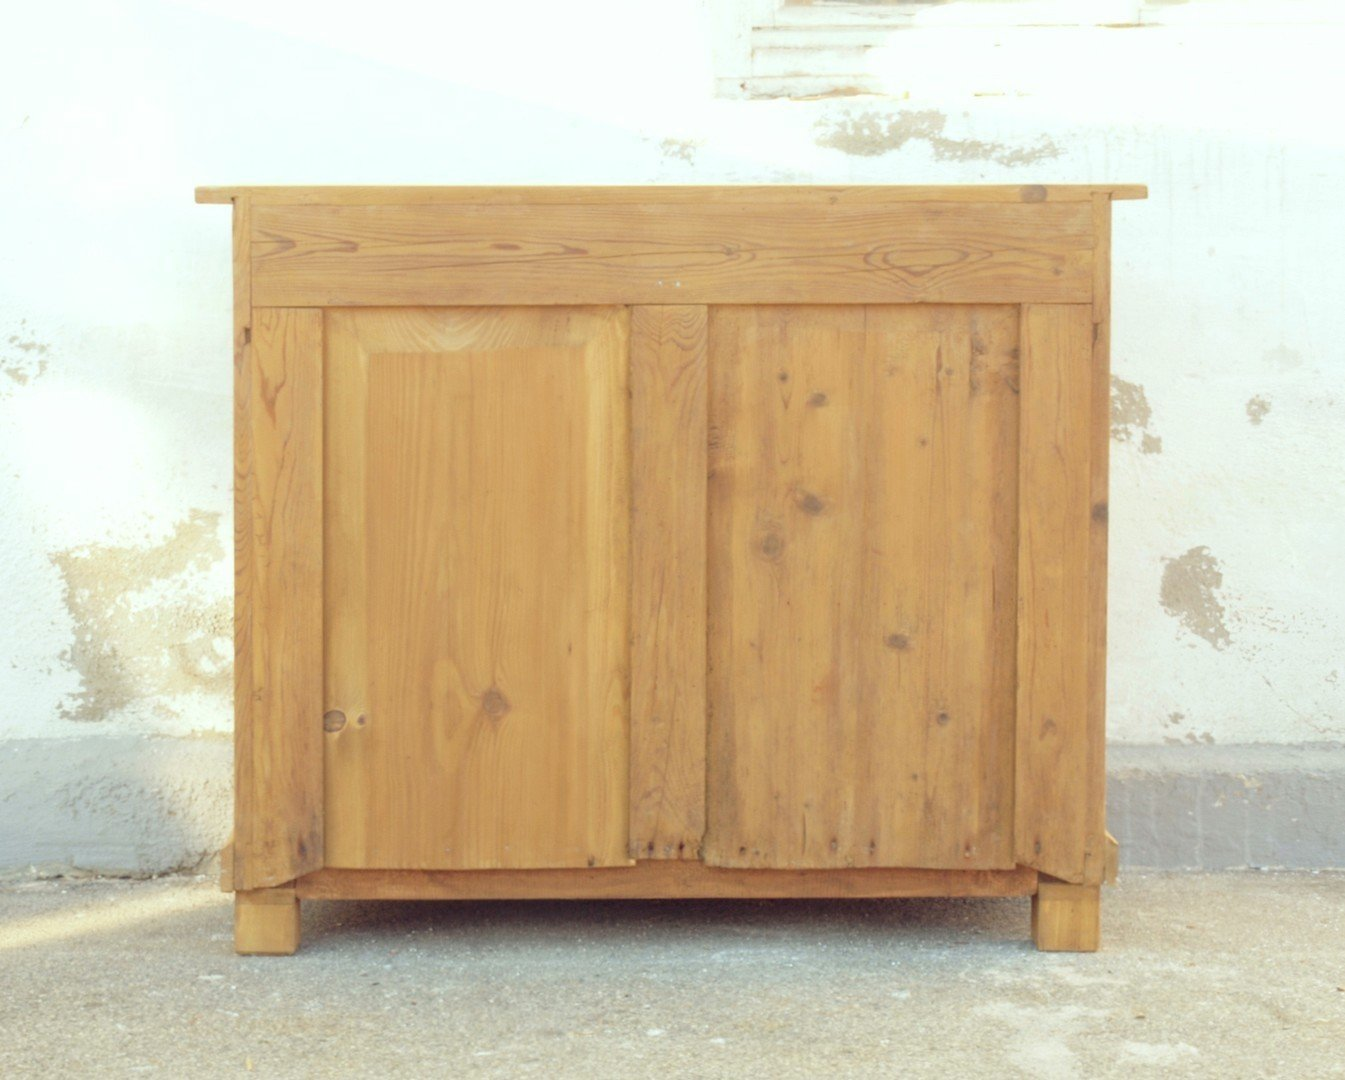 alte antike anrichte wickelkommode massivholz kiefer. Black Bedroom Furniture Sets. Home Design Ideas